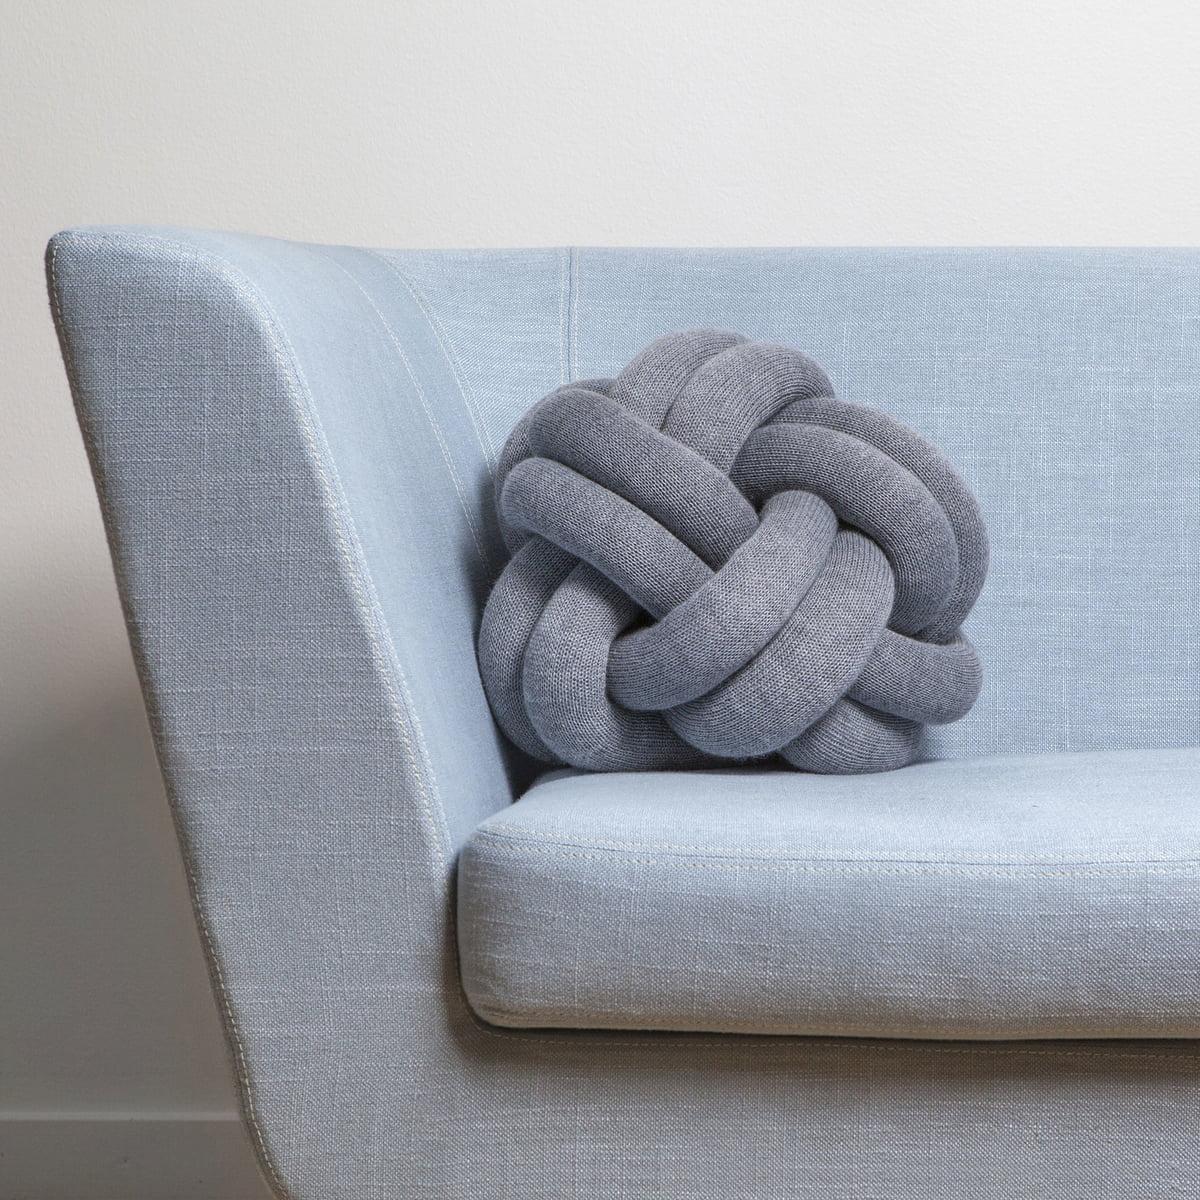 knot cushion by design house stockholm. Black Bedroom Furniture Sets. Home Design Ideas